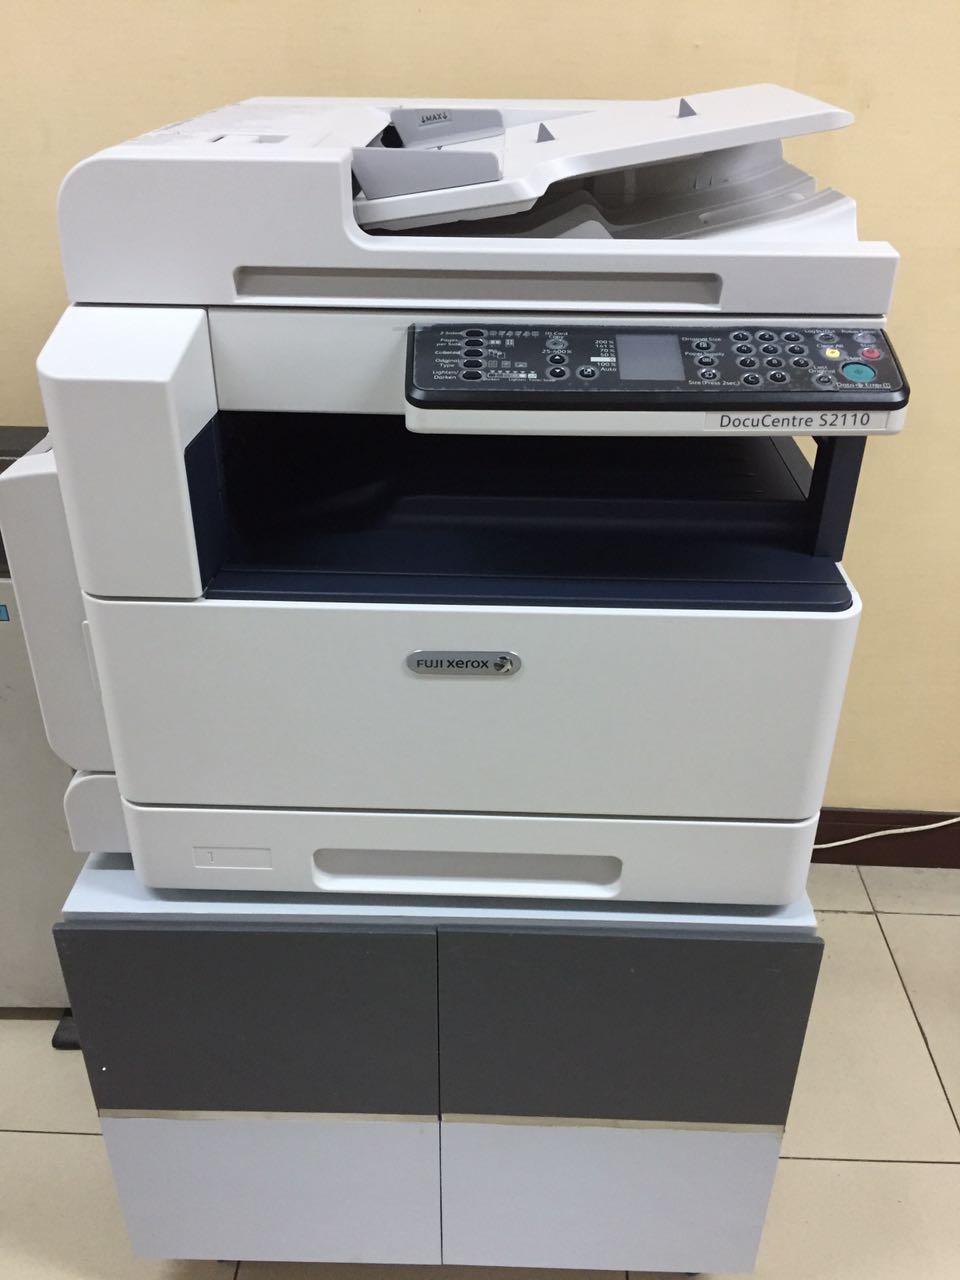 Fuji Xerox DCS 2110 cps